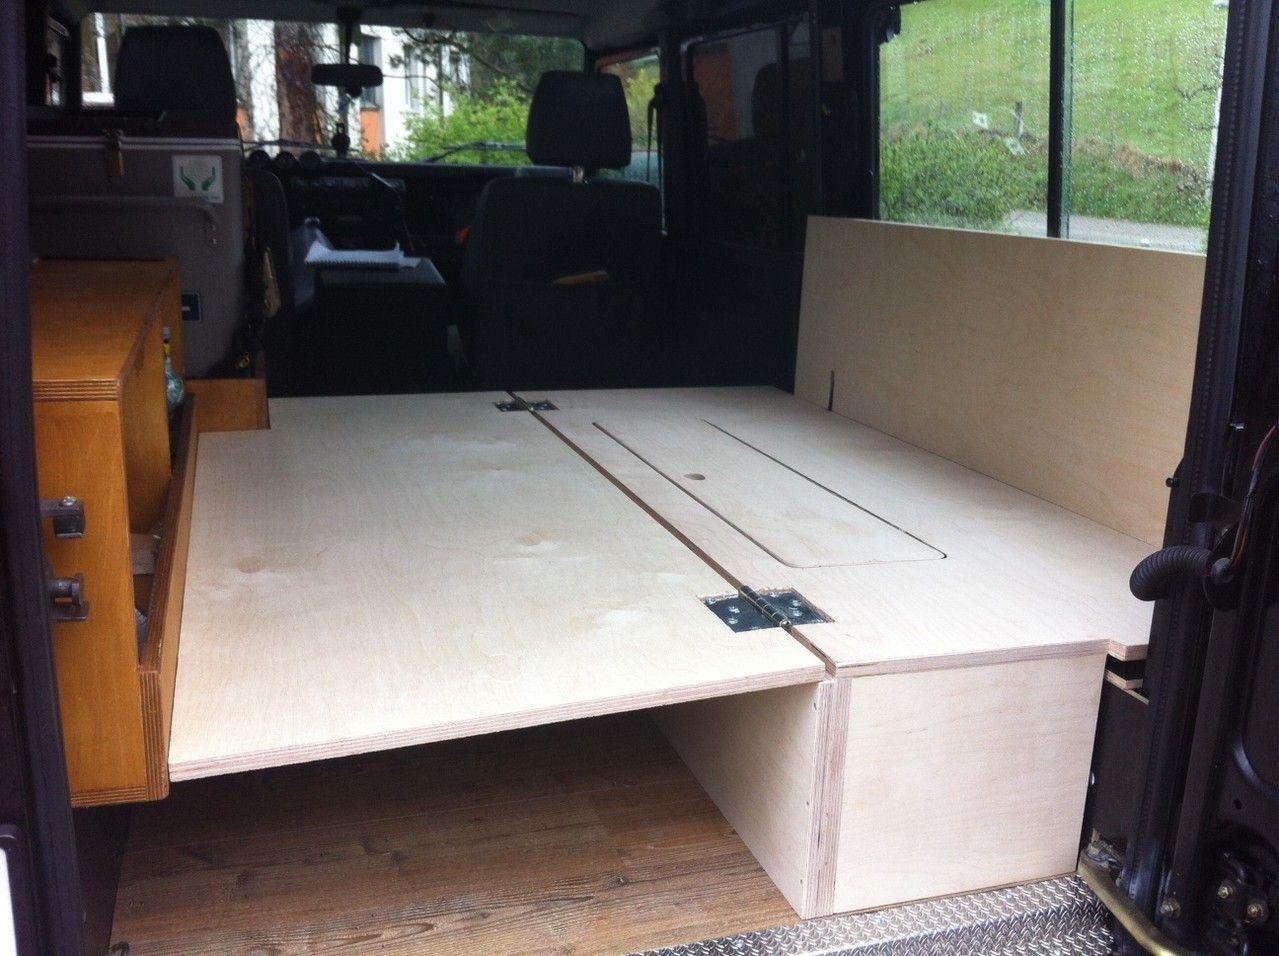 Defender Umbau Sitzecke/Bett Umbau, Camping ausbau, Ausbau